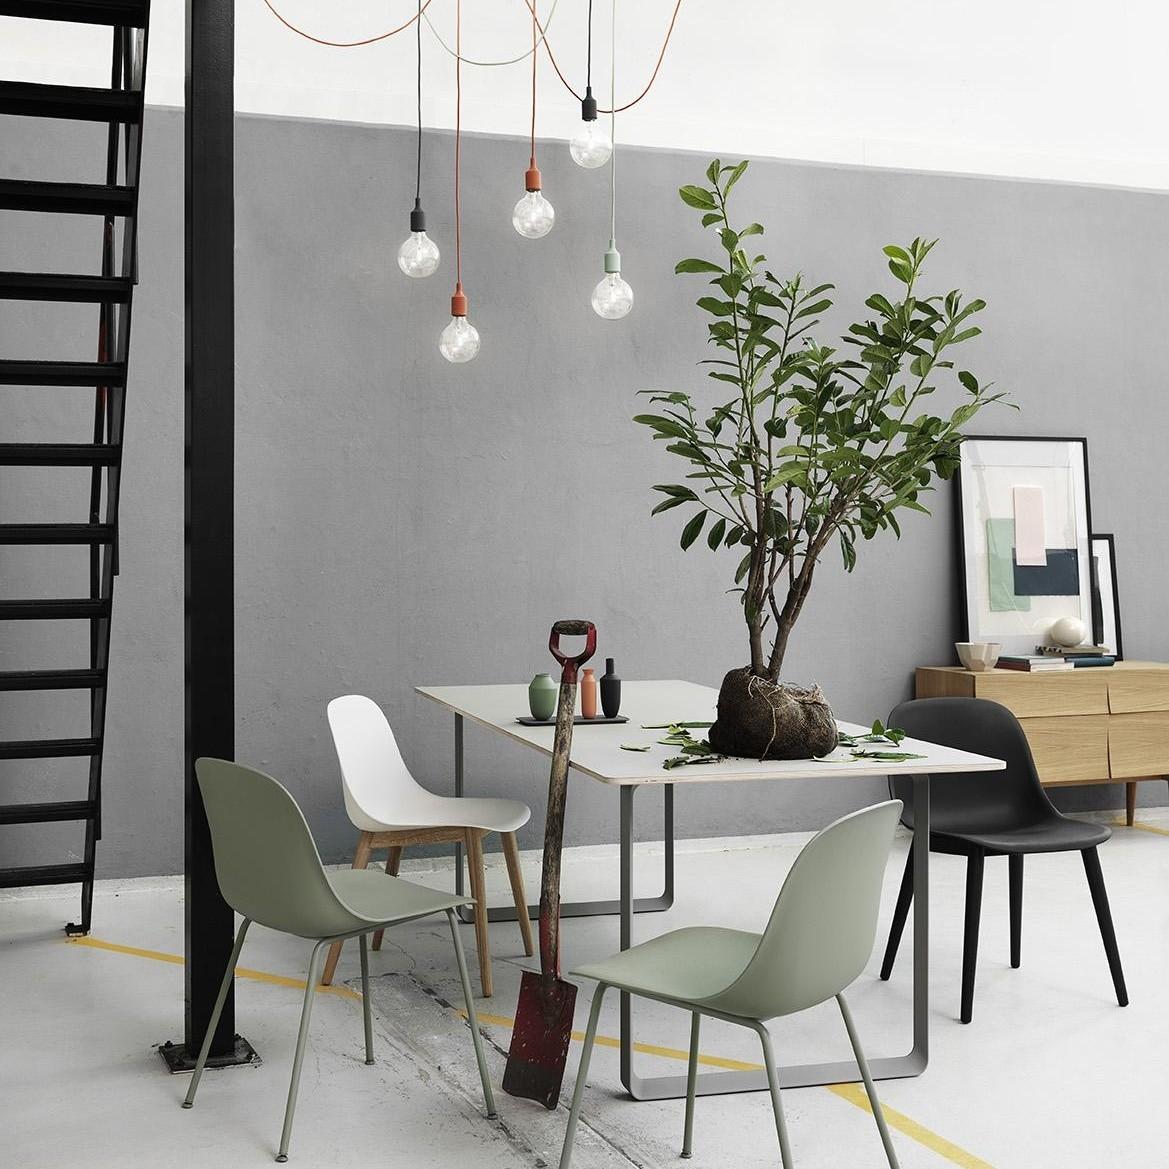 e27 suspension muuto. Black Bedroom Furniture Sets. Home Design Ideas